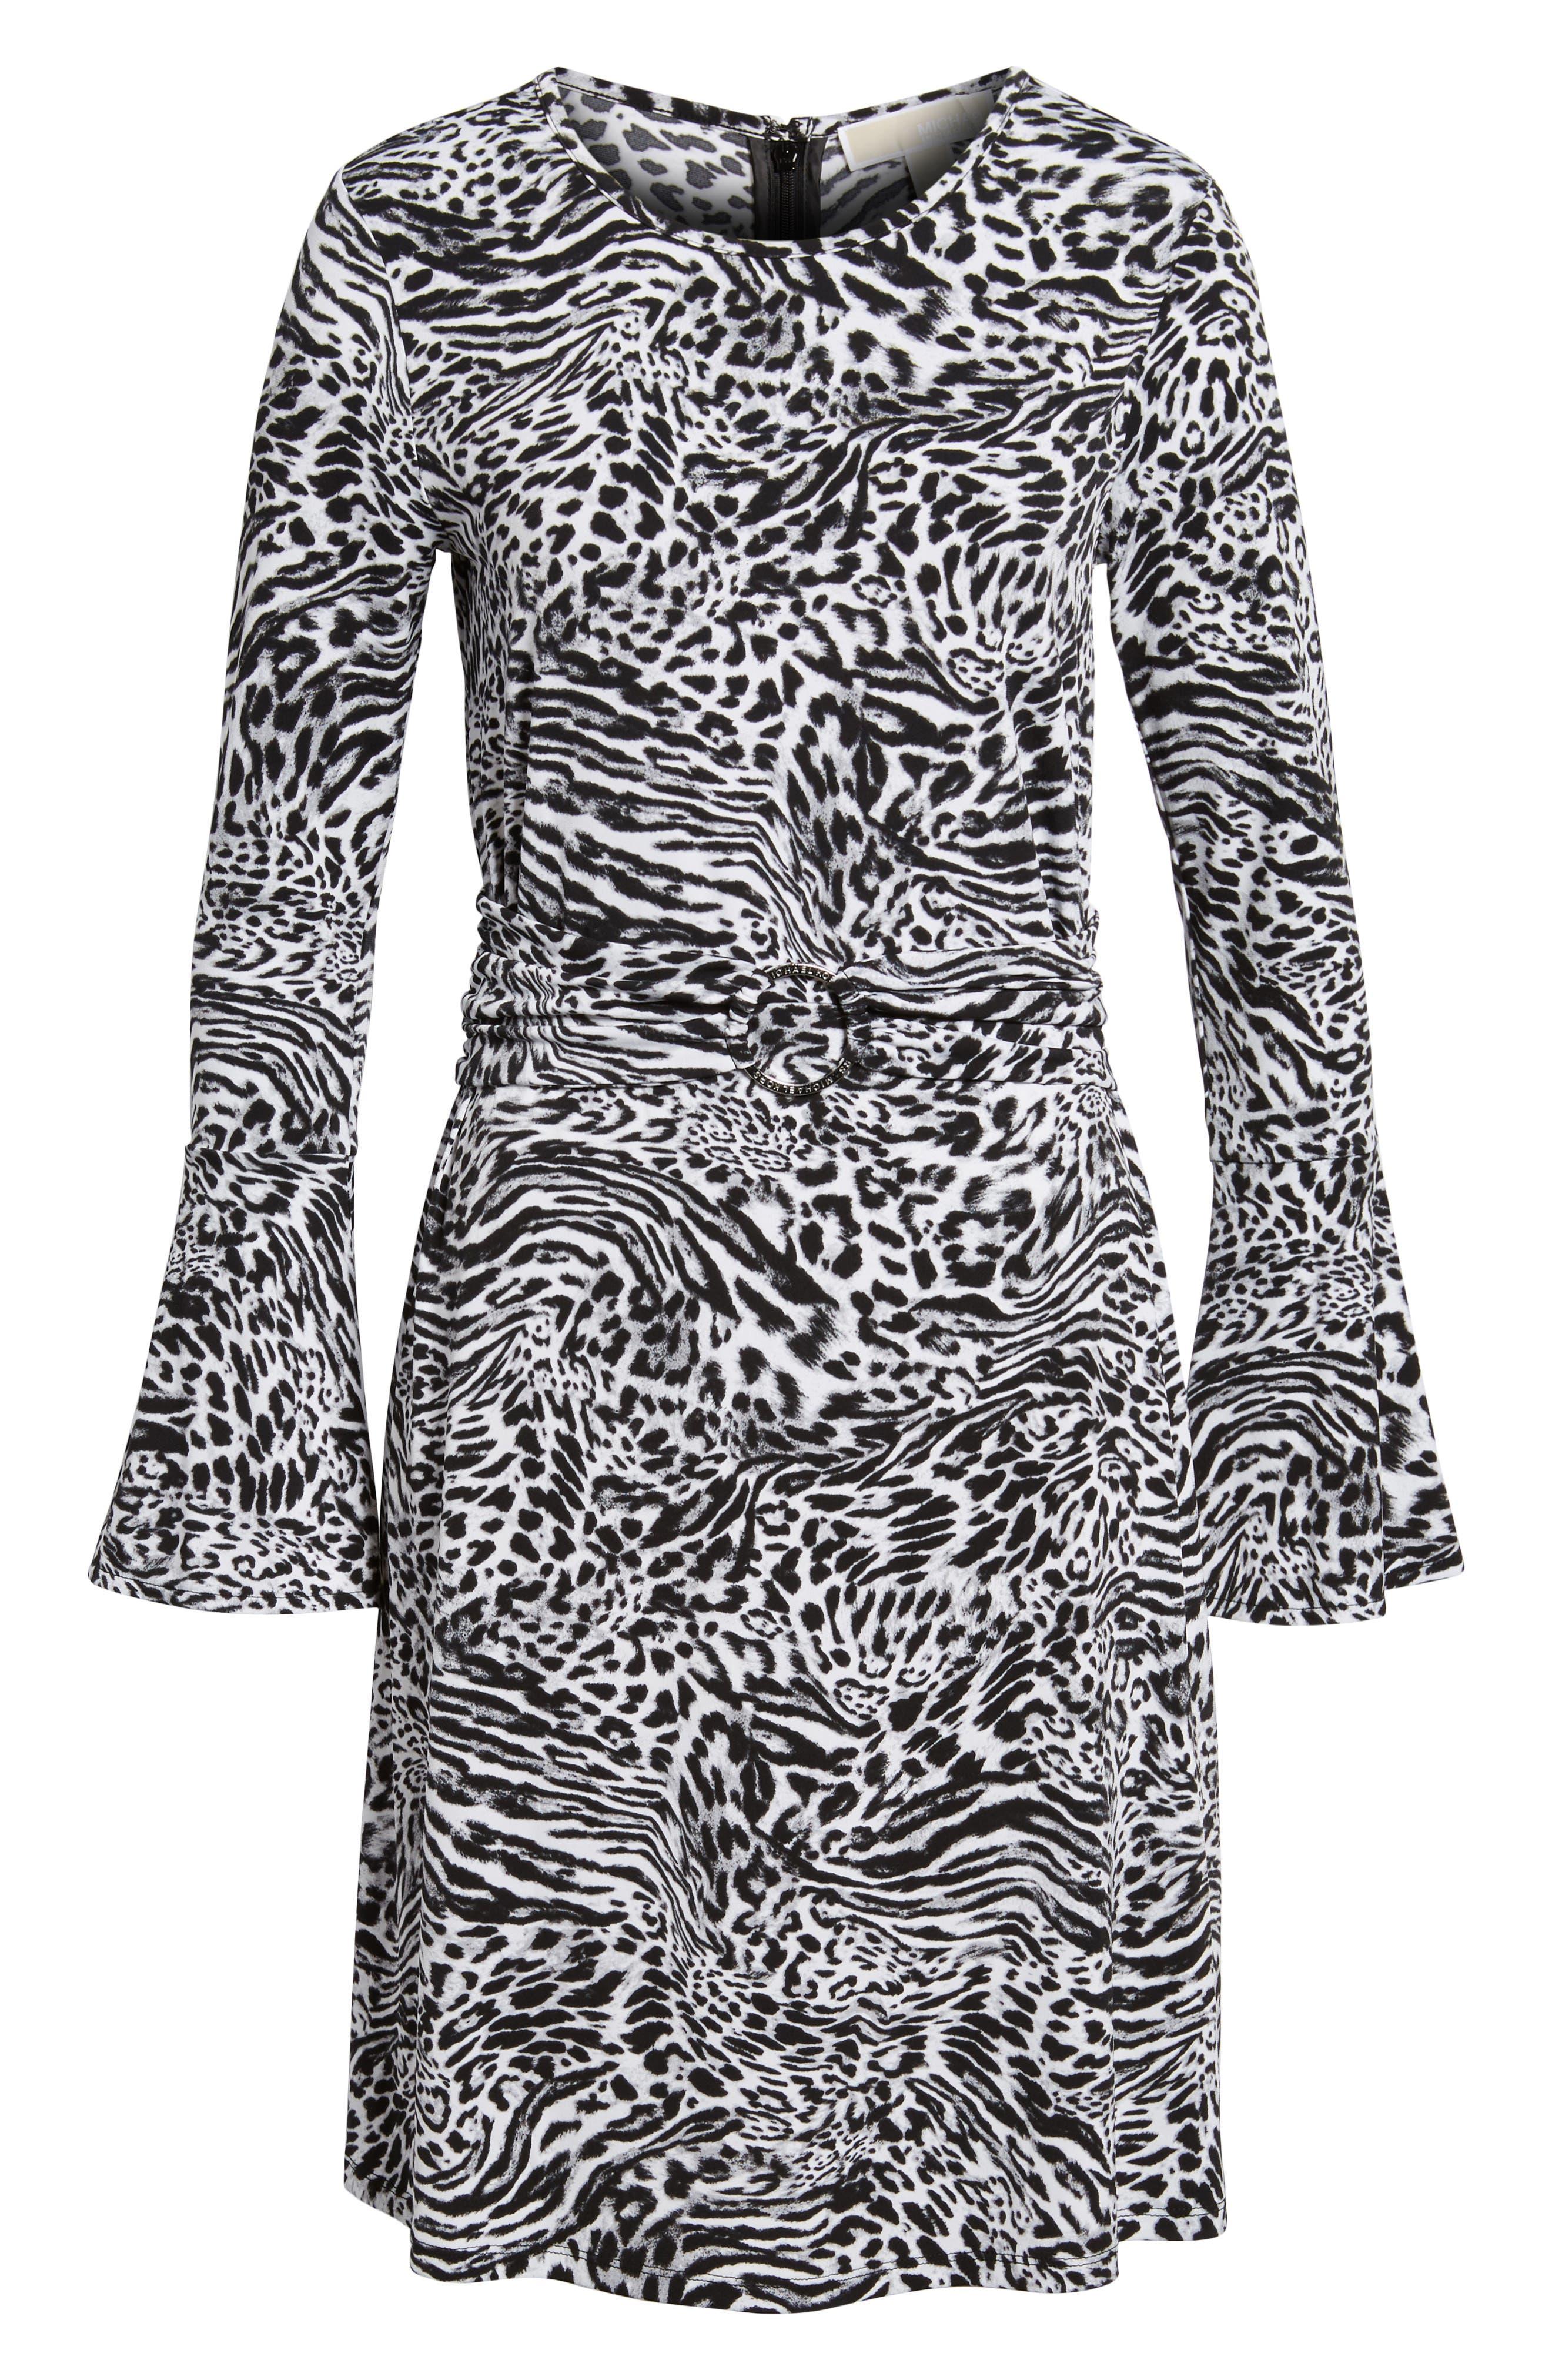 Big Cat A-Line Dress,                             Alternate thumbnail 6, color,                             001